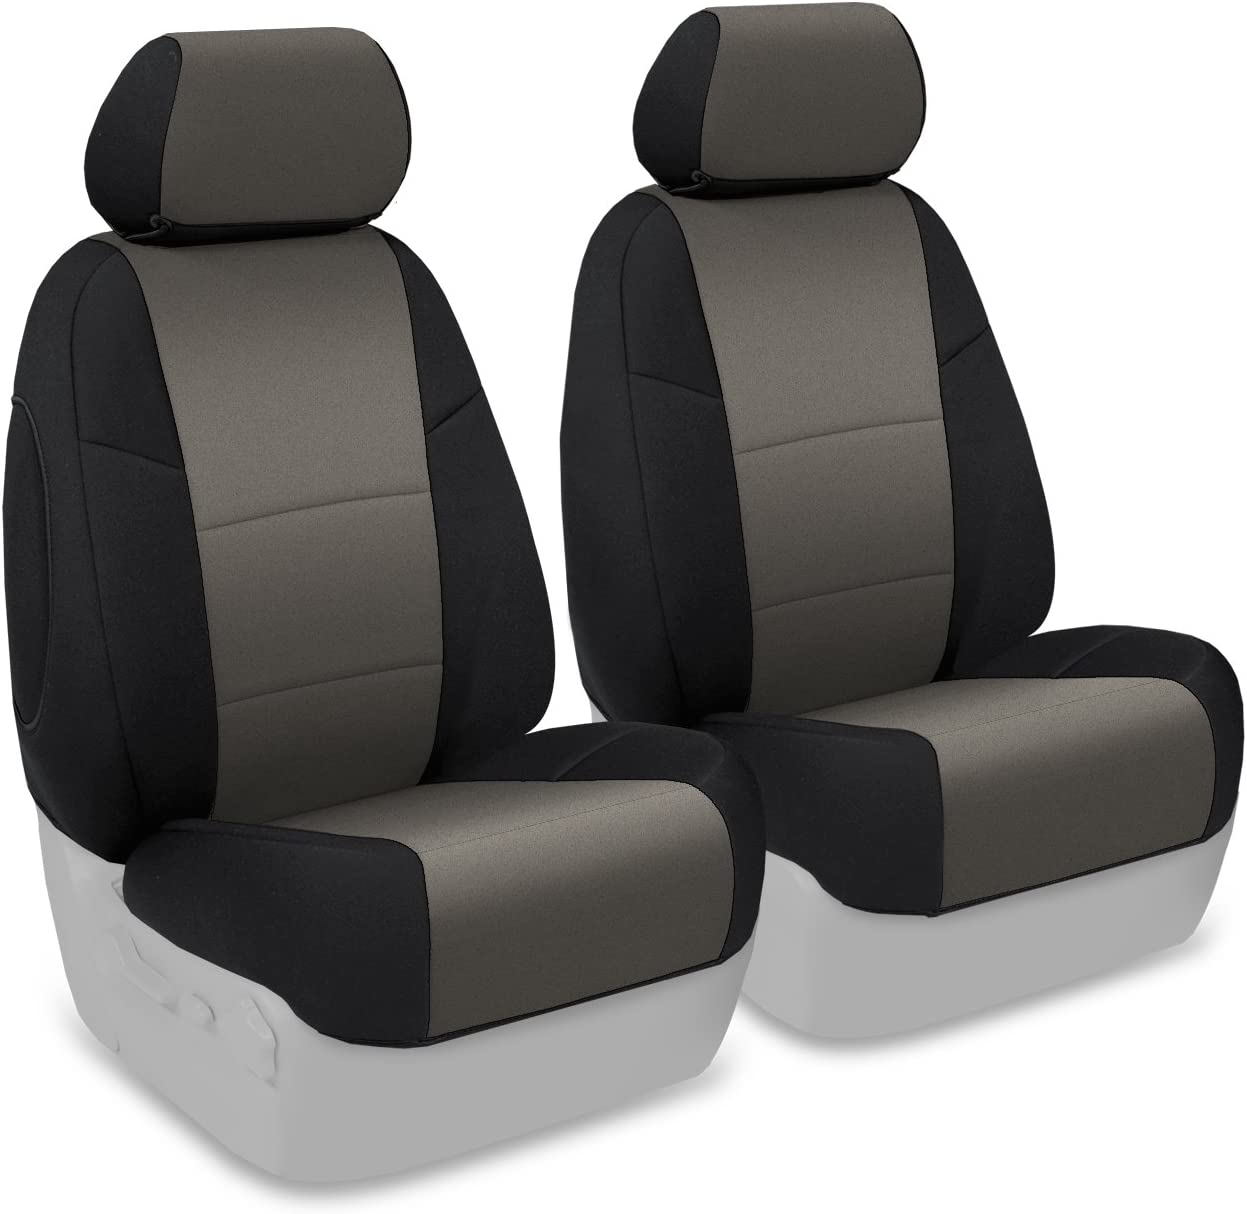 Coverking Neosupreme Bucket Seat Cover